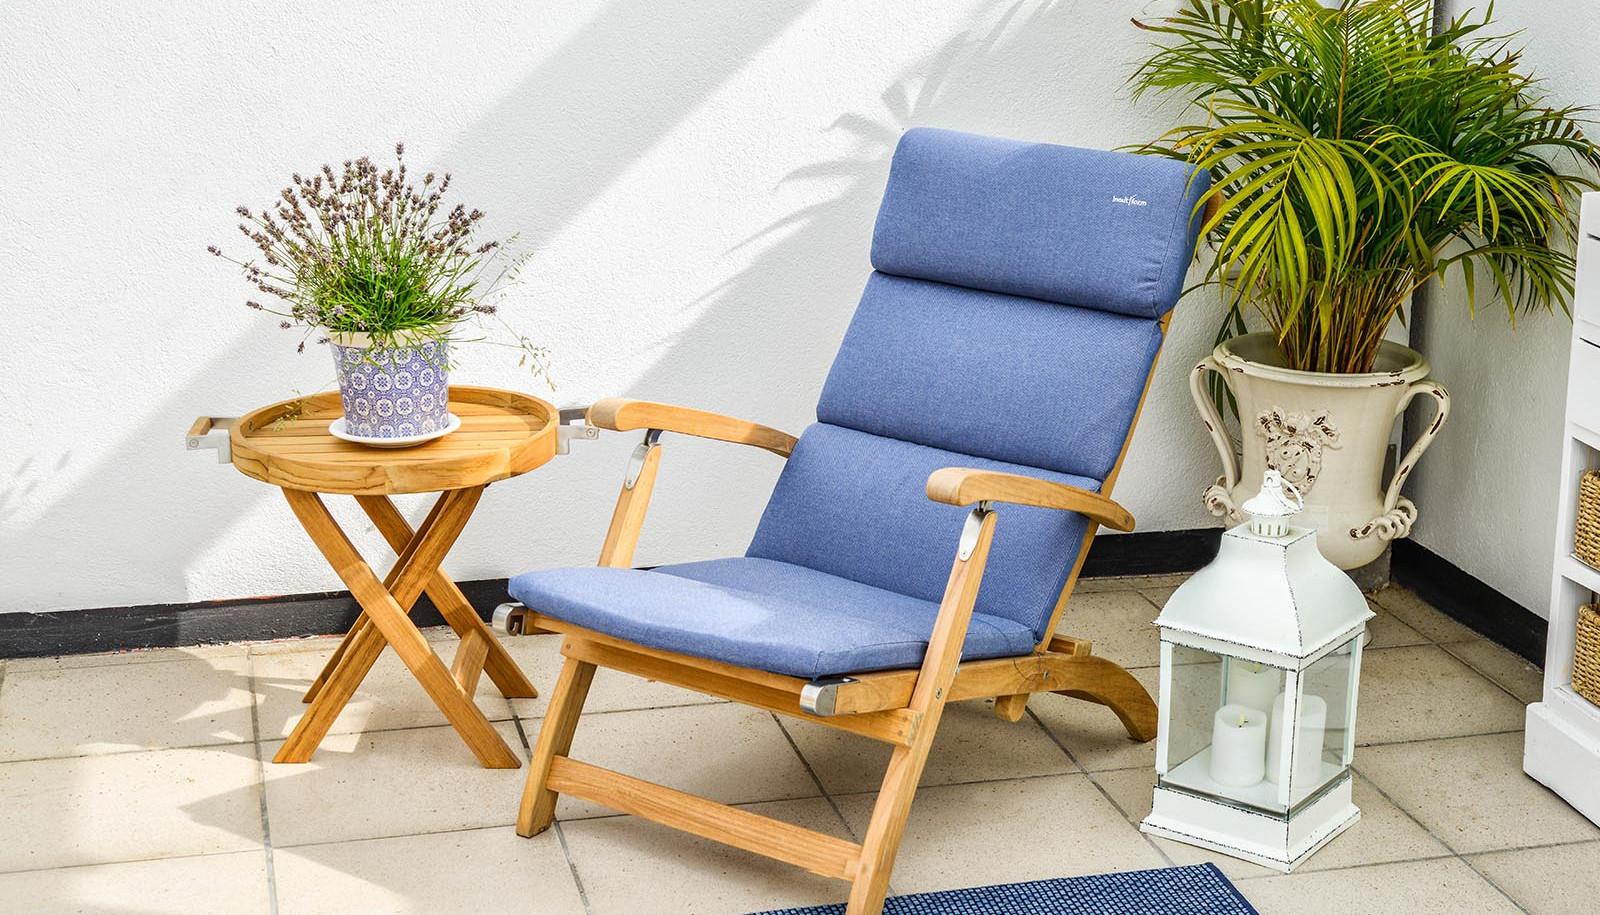 inout form Deckchair ljusblå dyna